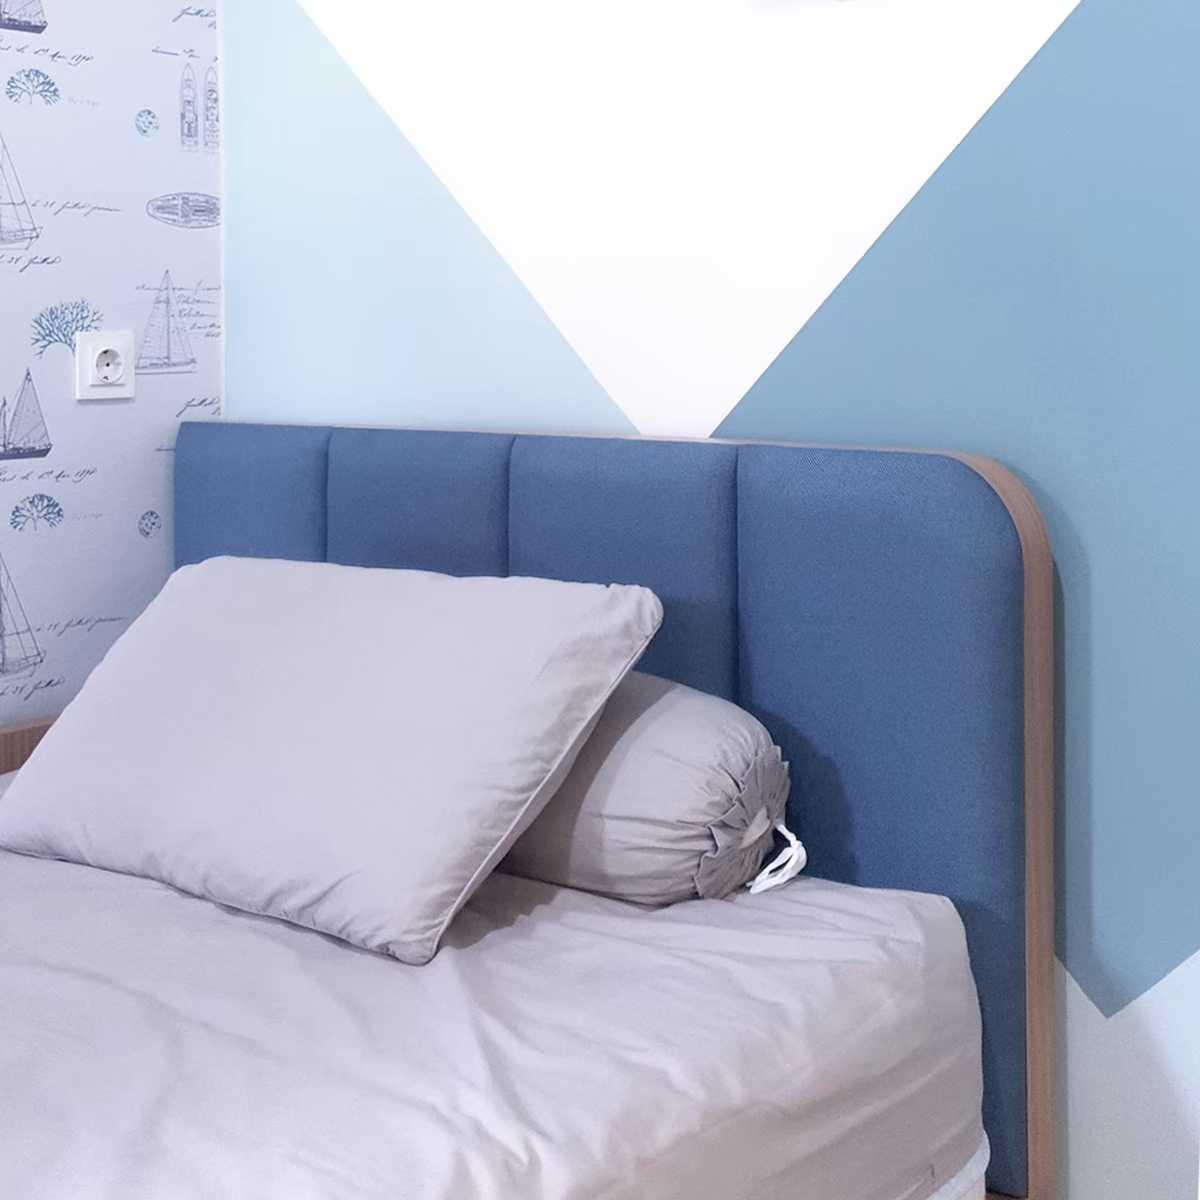 9596 Design Studio Bsd Kids Bedroom Lengkong Kulon, Kec. Pagedangan, Tangerang, Banten 15331, Indonesia Sinar Mas Land Plaza Jl. Grand Boulevard Bsd City, Sampora, Kec. Cisauk, Tangerang, Banten 15345, Indonesia 9596-Design-Studio-Bsd-Kids-Bedroom  122554